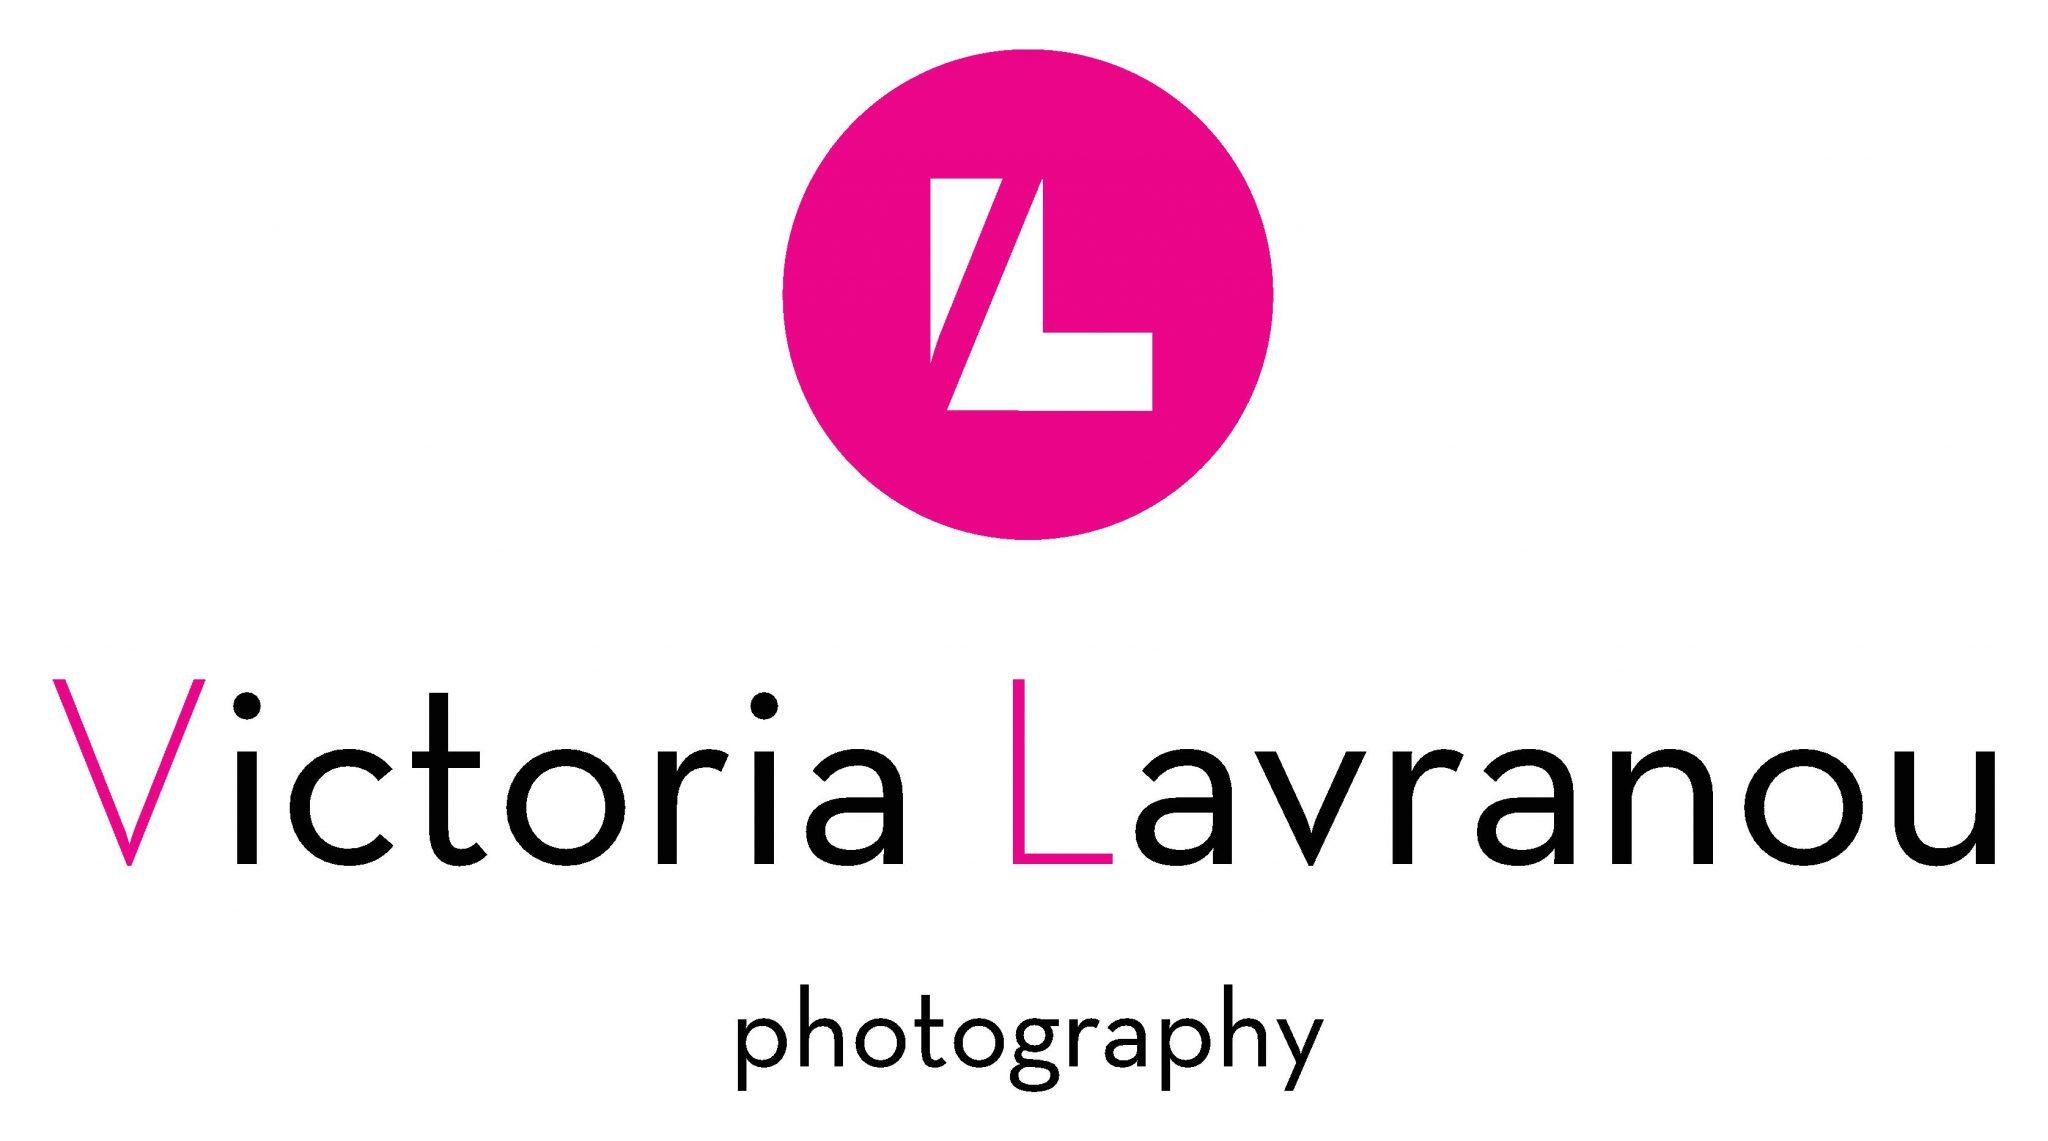 Victoria Lavranou Photography